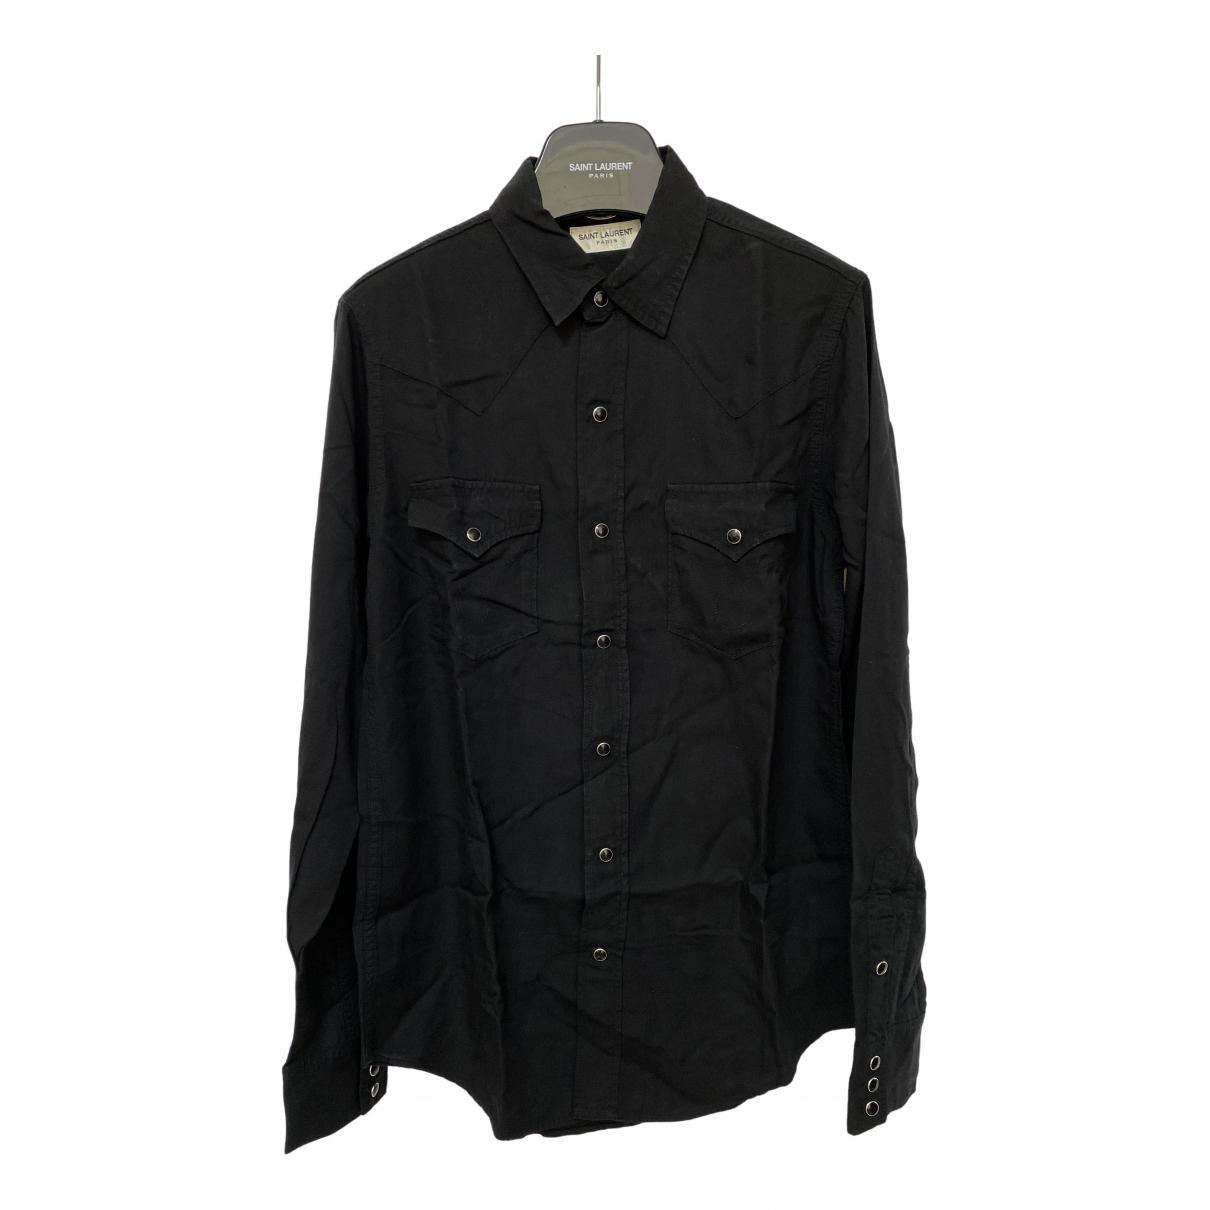 Saint Laurent N Black Shirts for Men S International